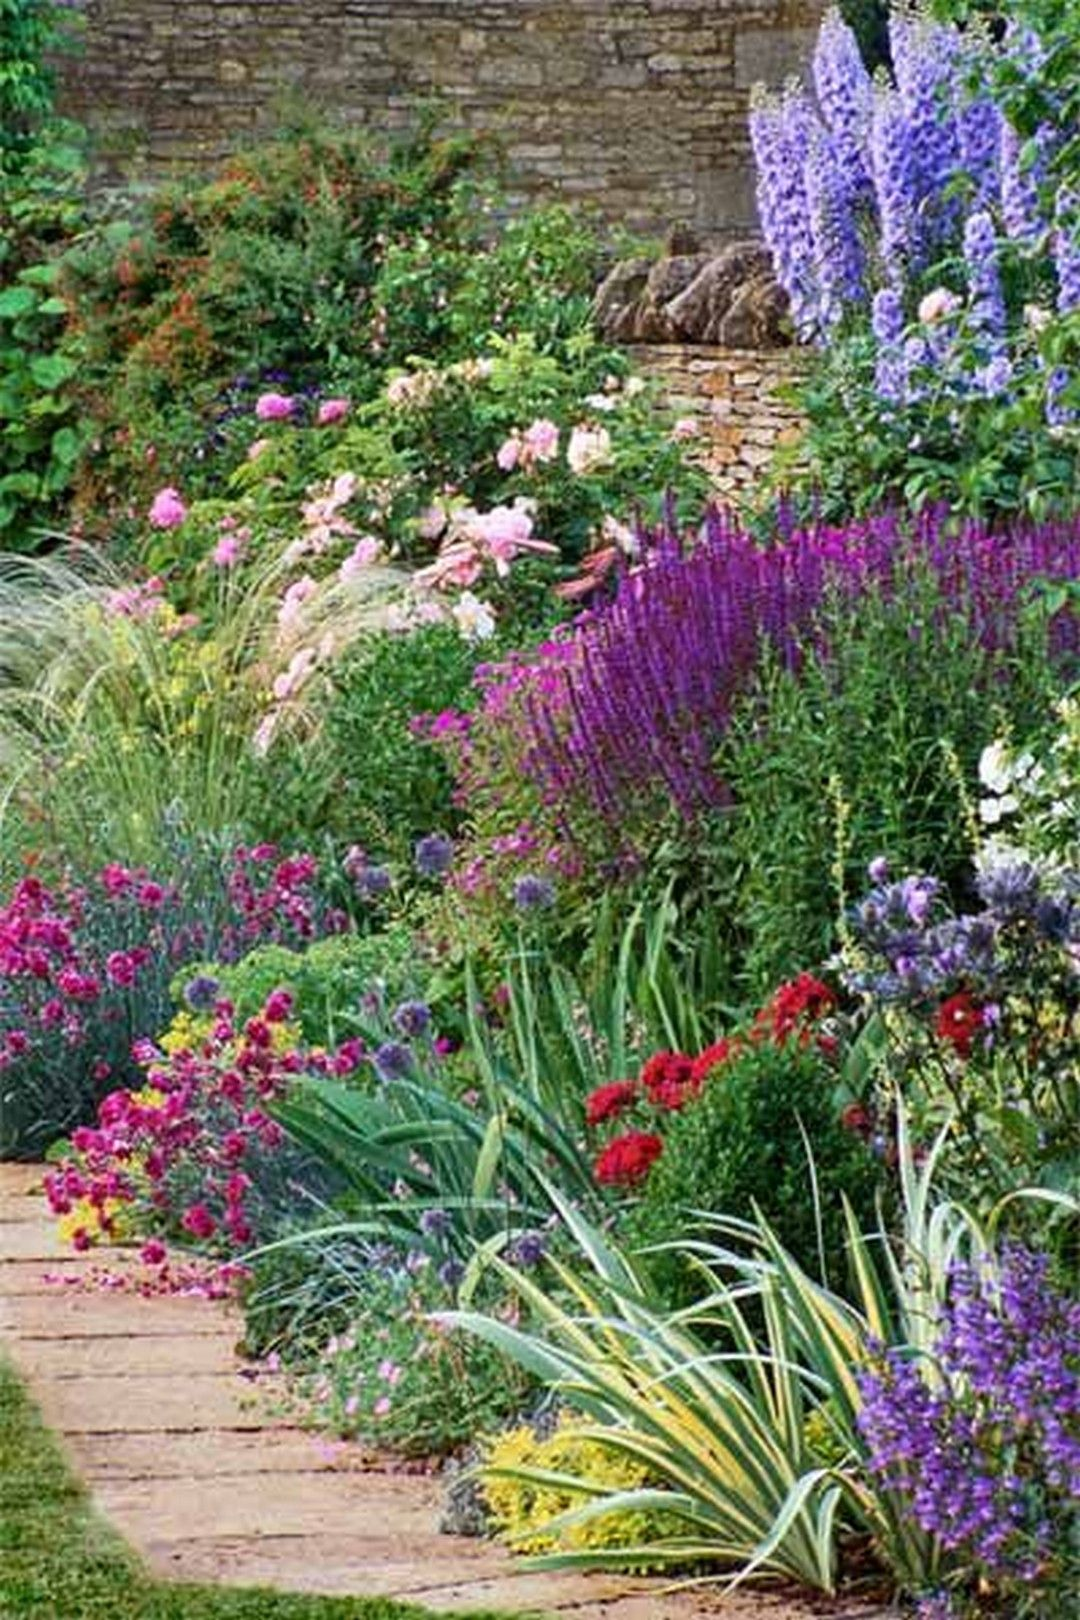 Best Diy Cottage Garden Ideas From Pinterest 36 Jpg 1 080 620 Pixels Plants Perennials